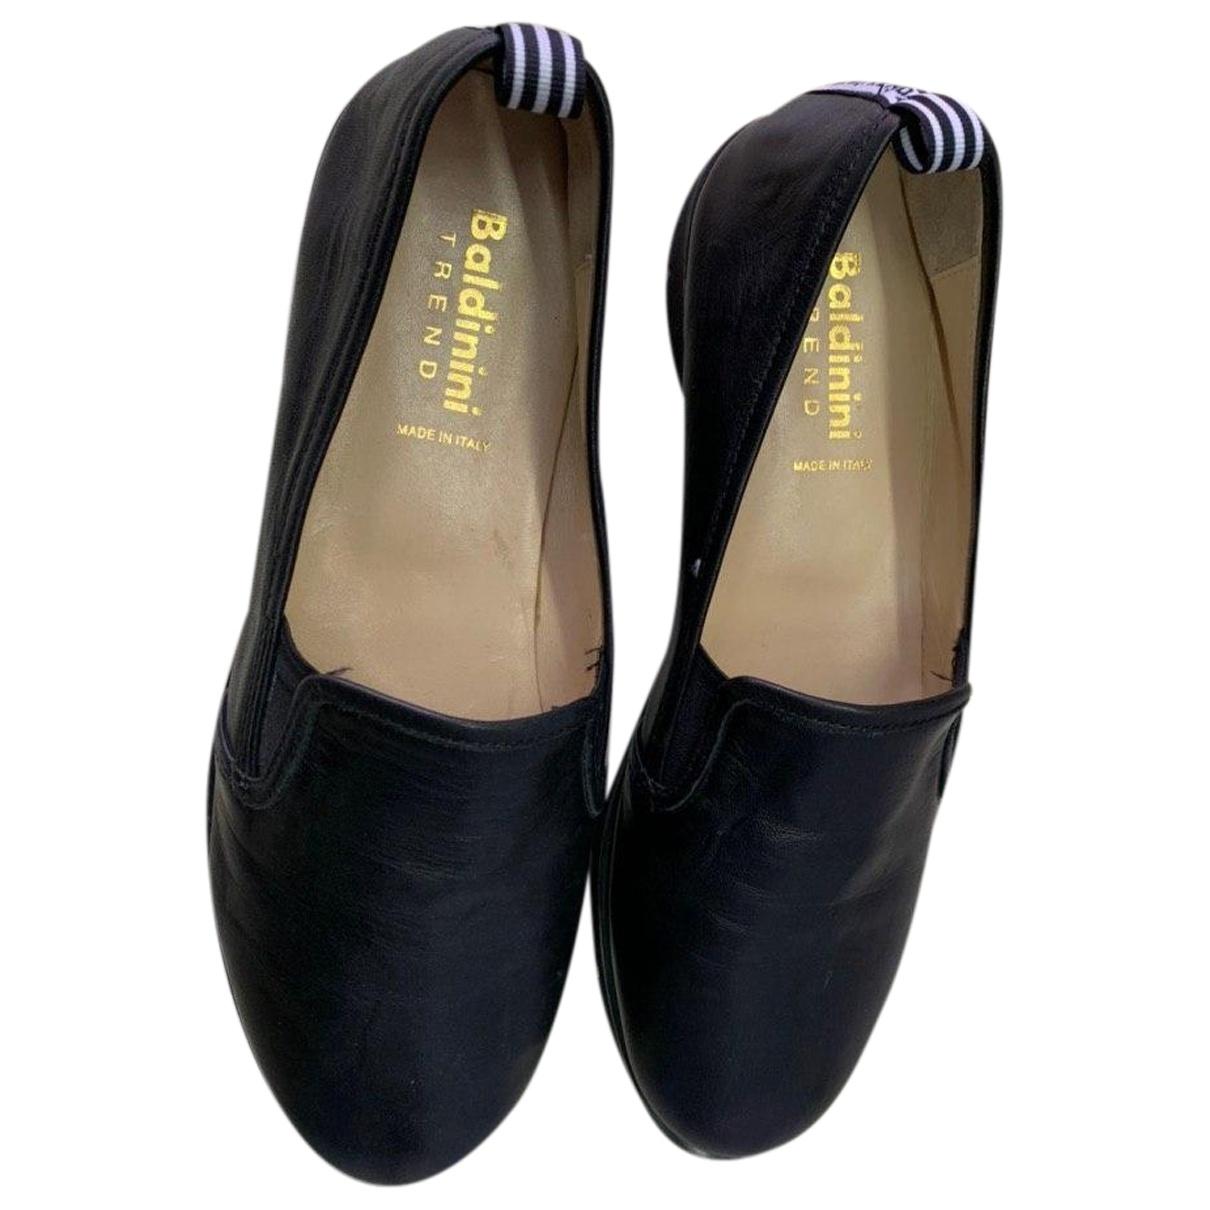 Baldinini \N Black Leather Flats for Women 37.5 EU